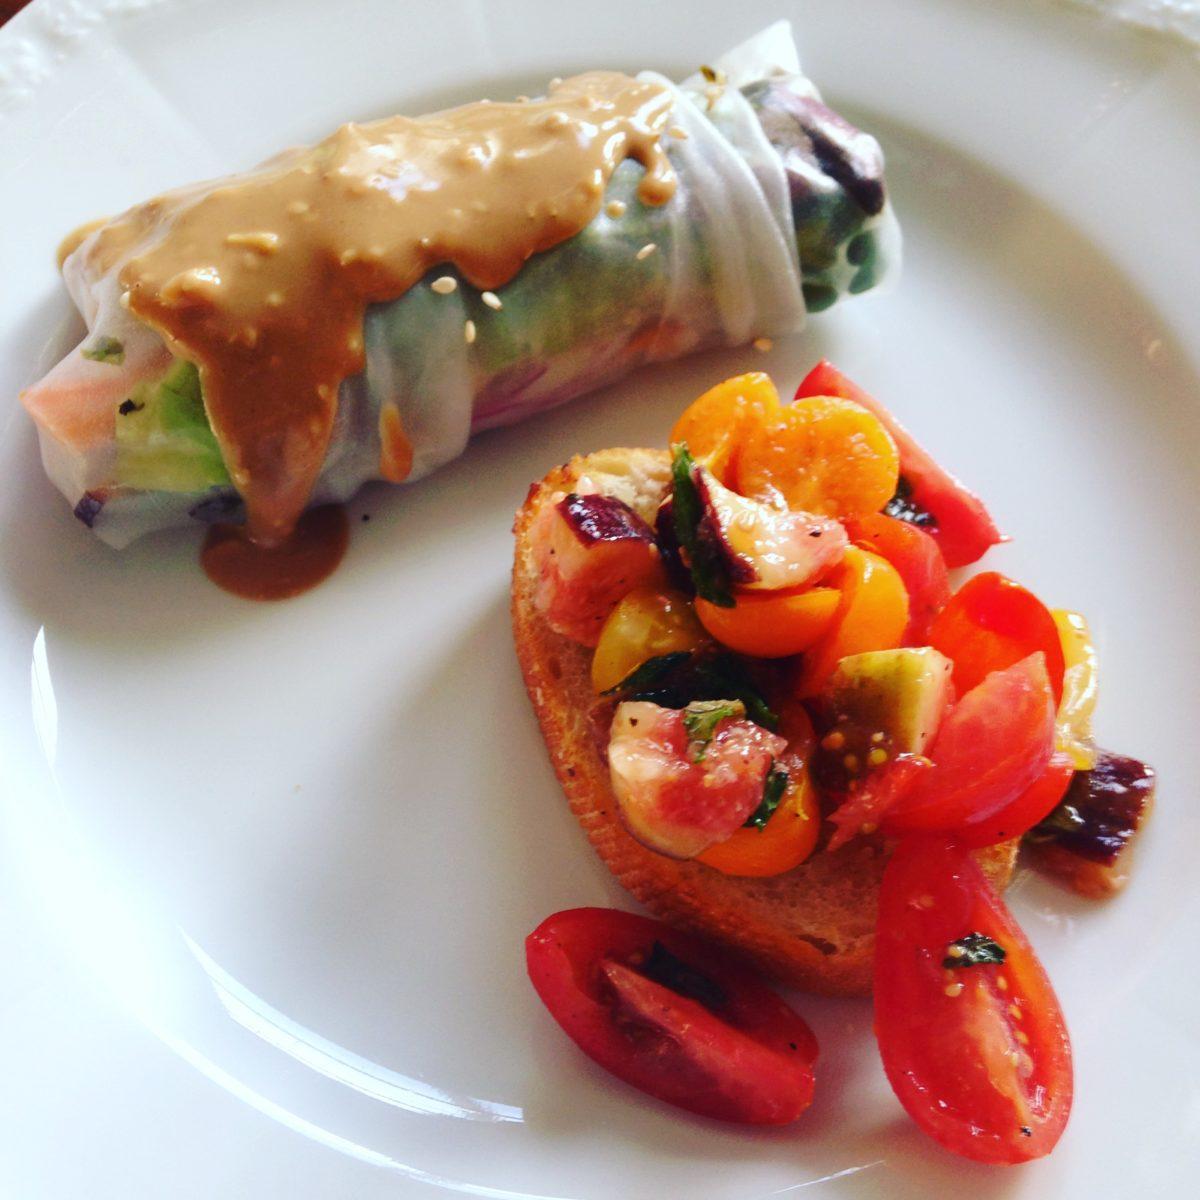 Vegane Kochkurse: Hinter den Kulissen